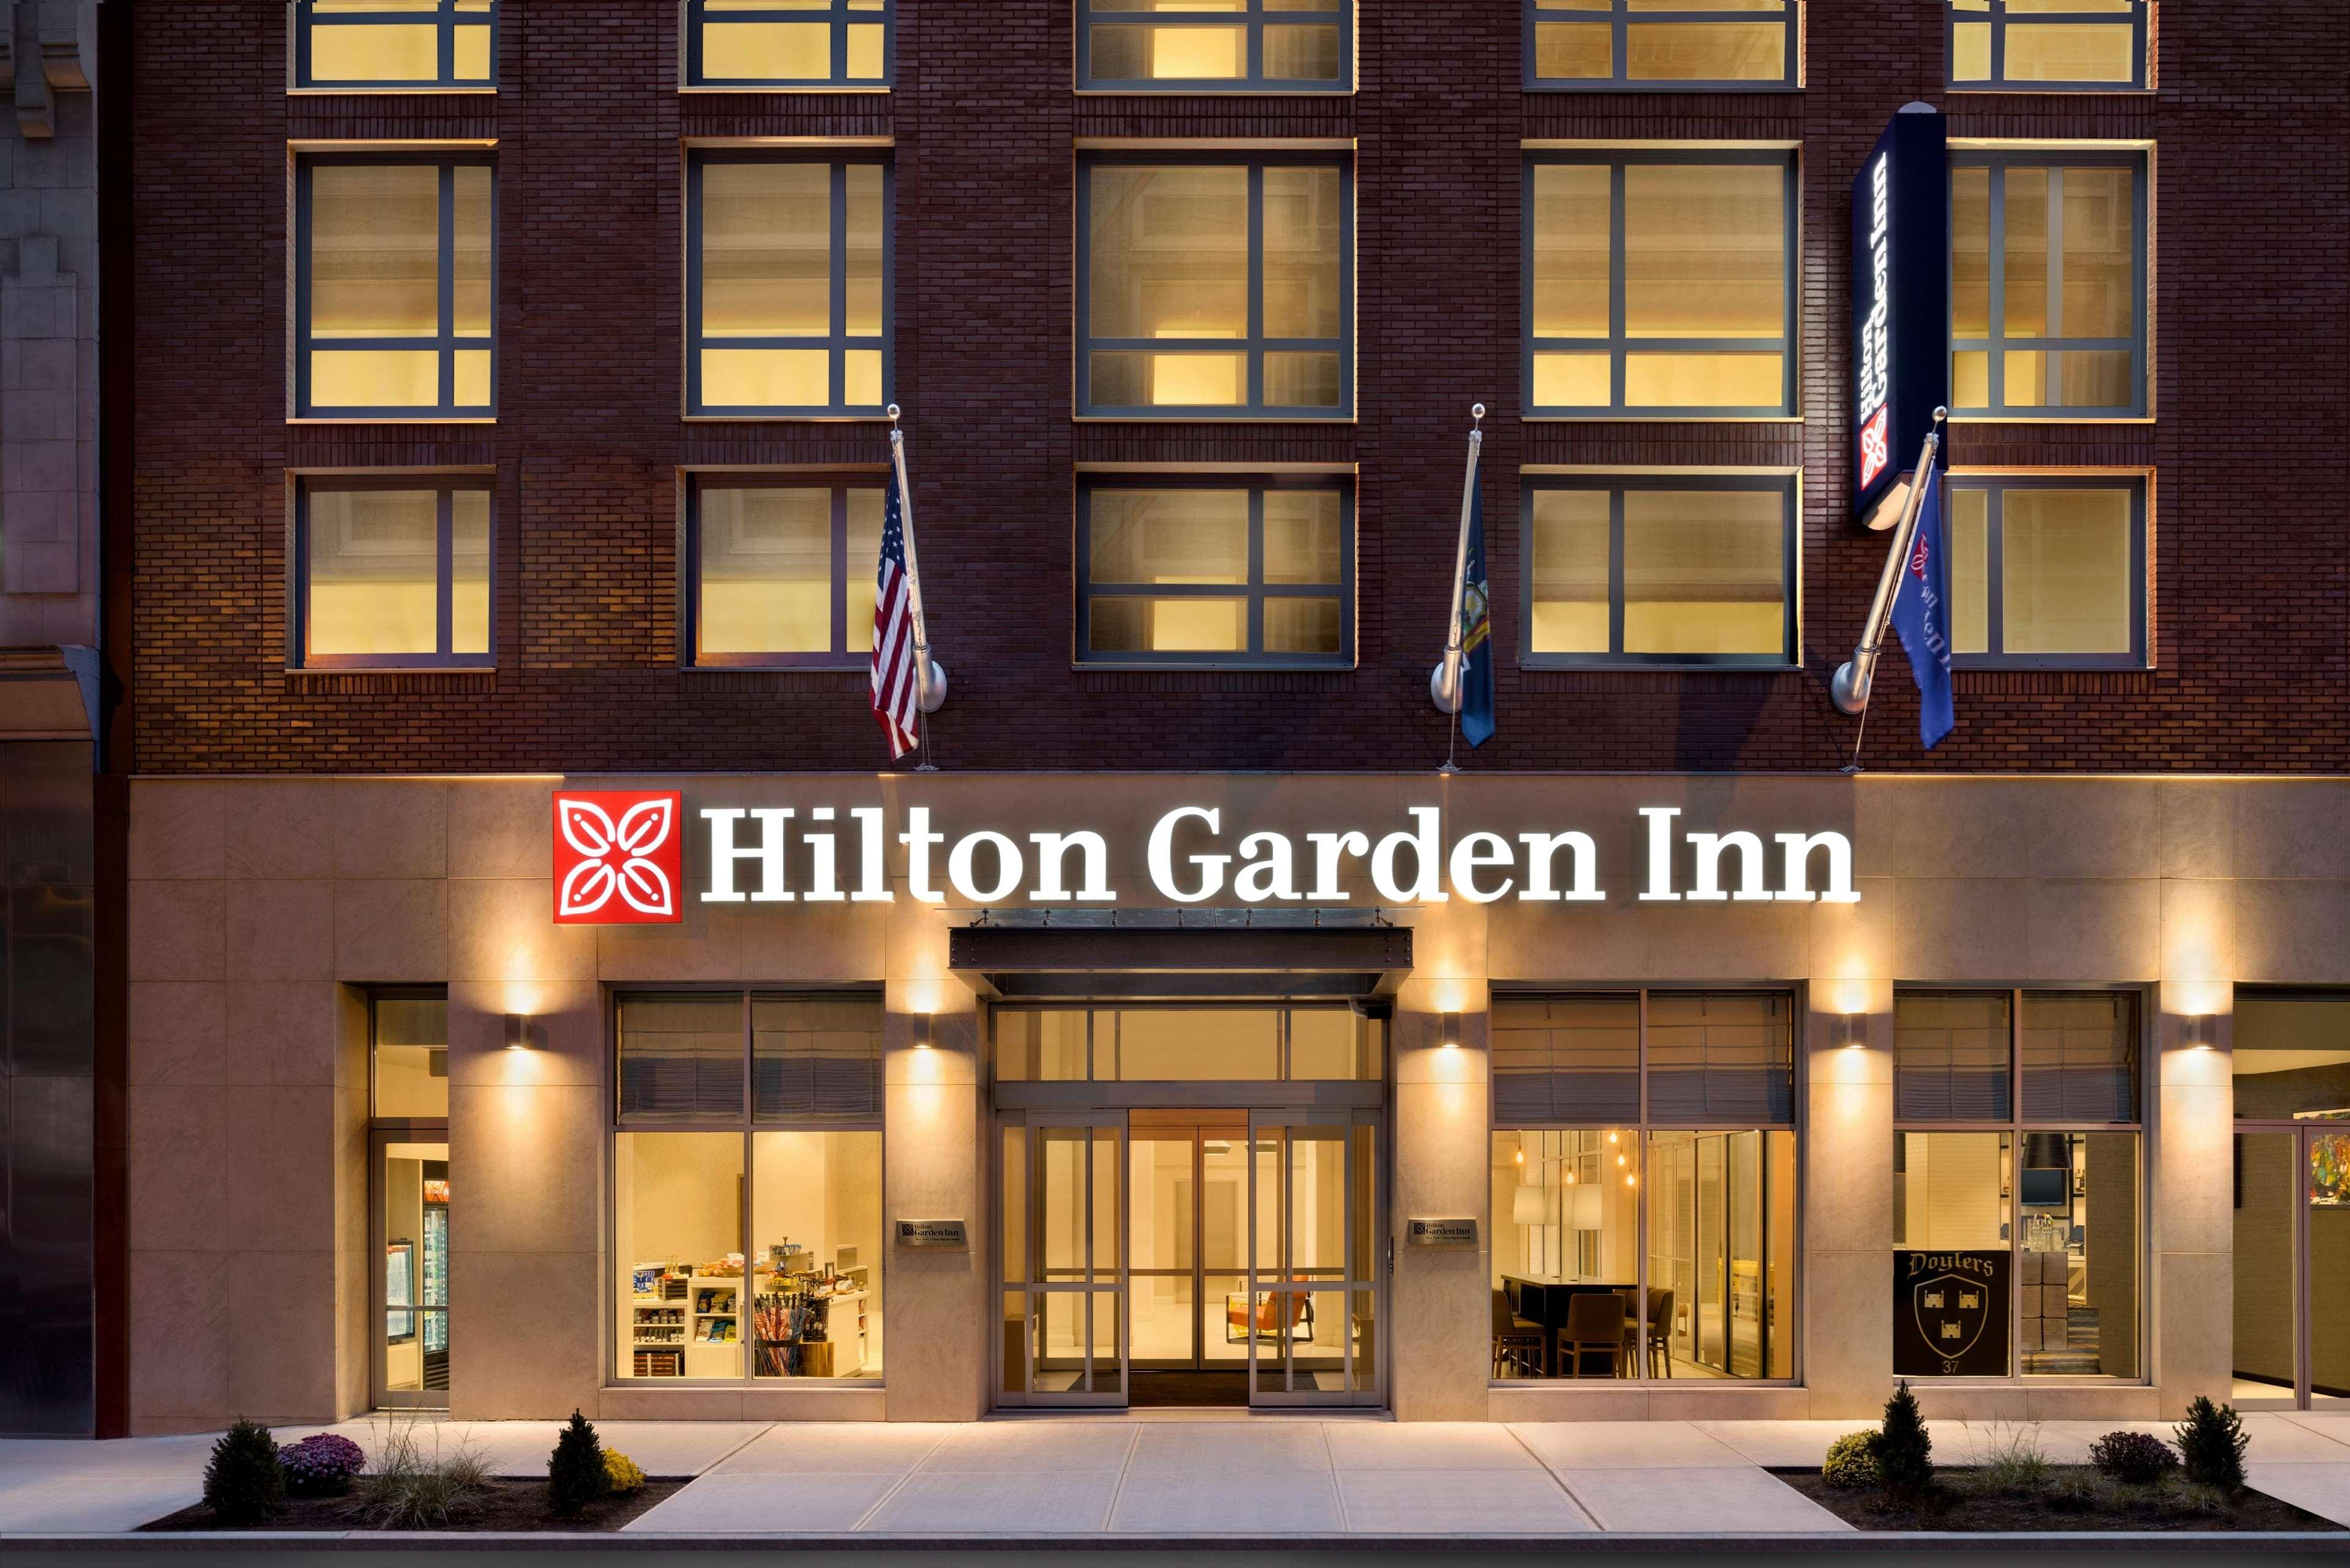 Hilton Garden Inn New York Times Square South - New York City, NY